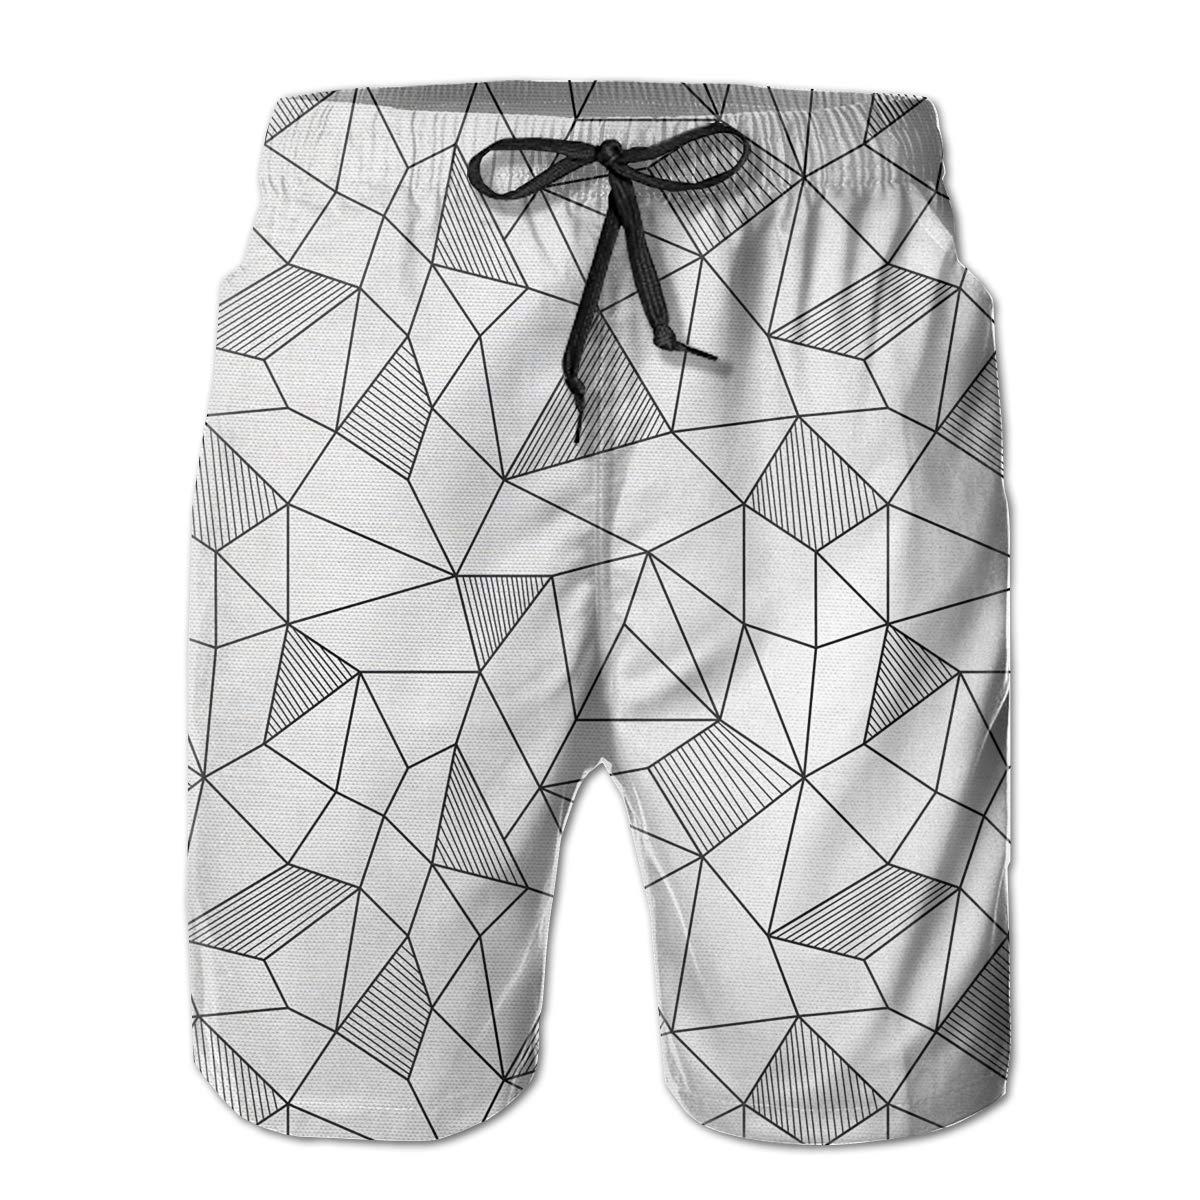 Bilybily Surreal Doodle Drawing Style Men Shorts Summer Loose Men Print Drawstring Casual Beach Work Short Trouser Shorts Pants with Pocket